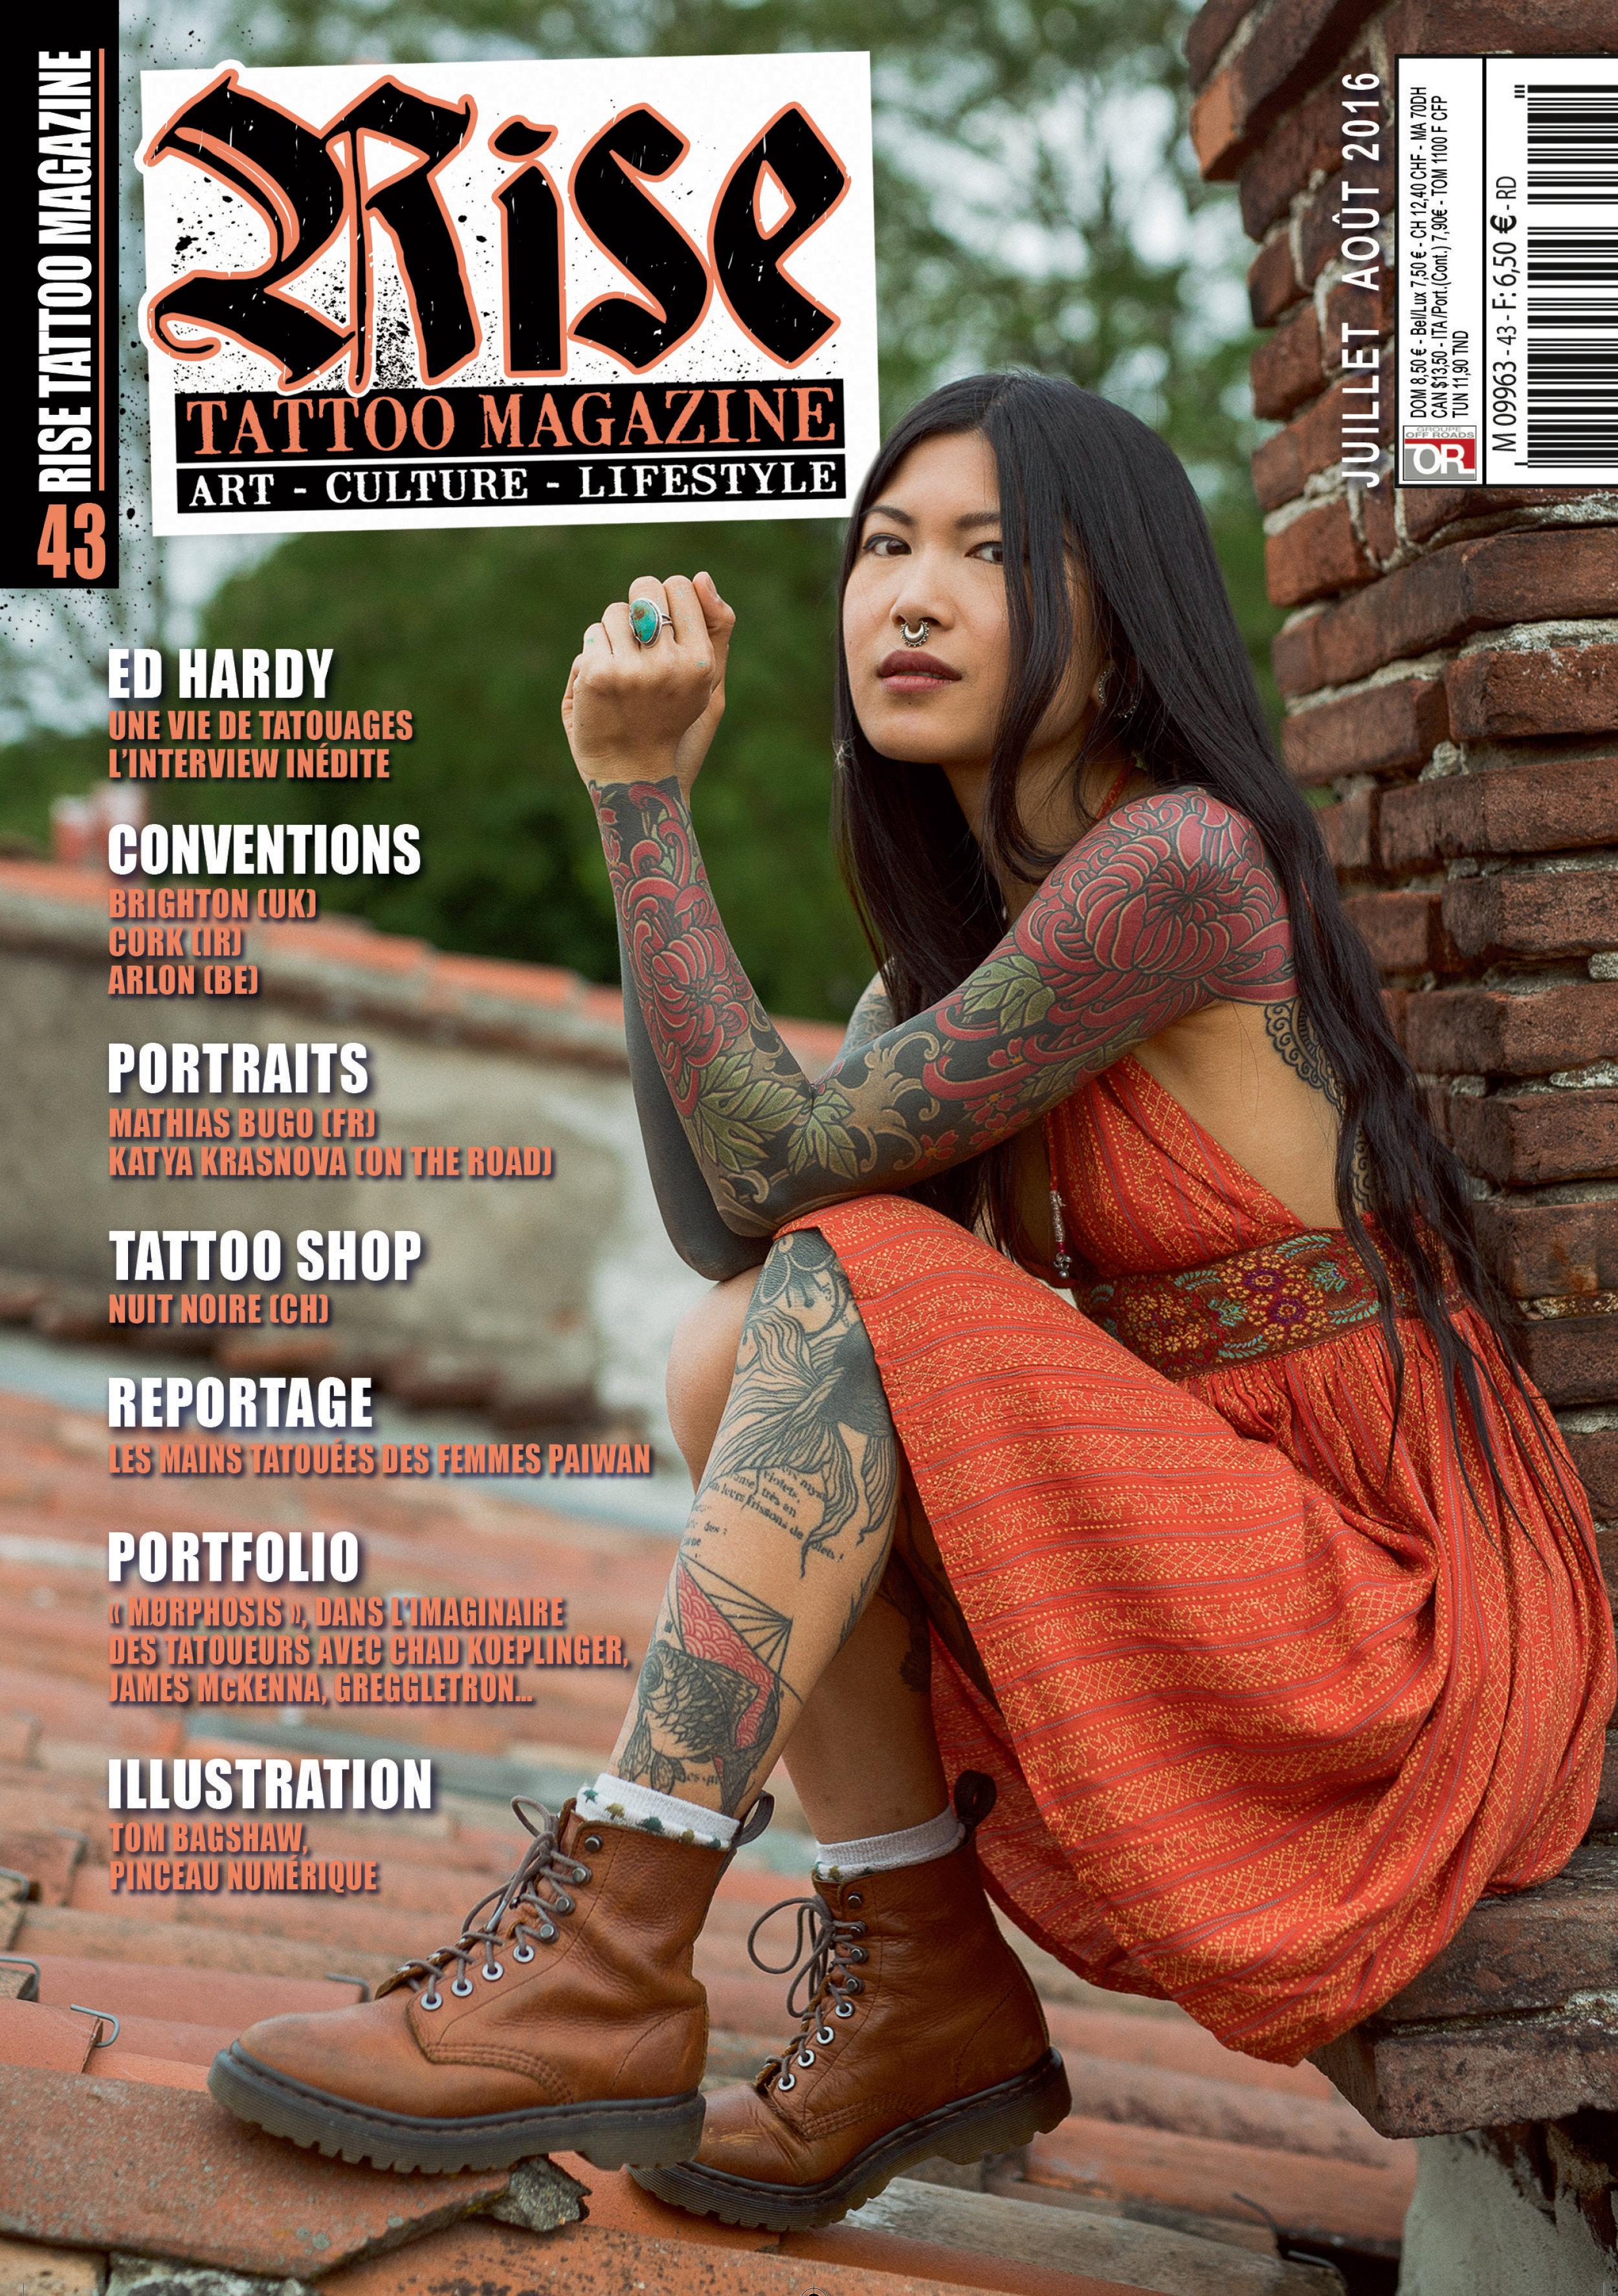 Rise Tattoo Magazine #43